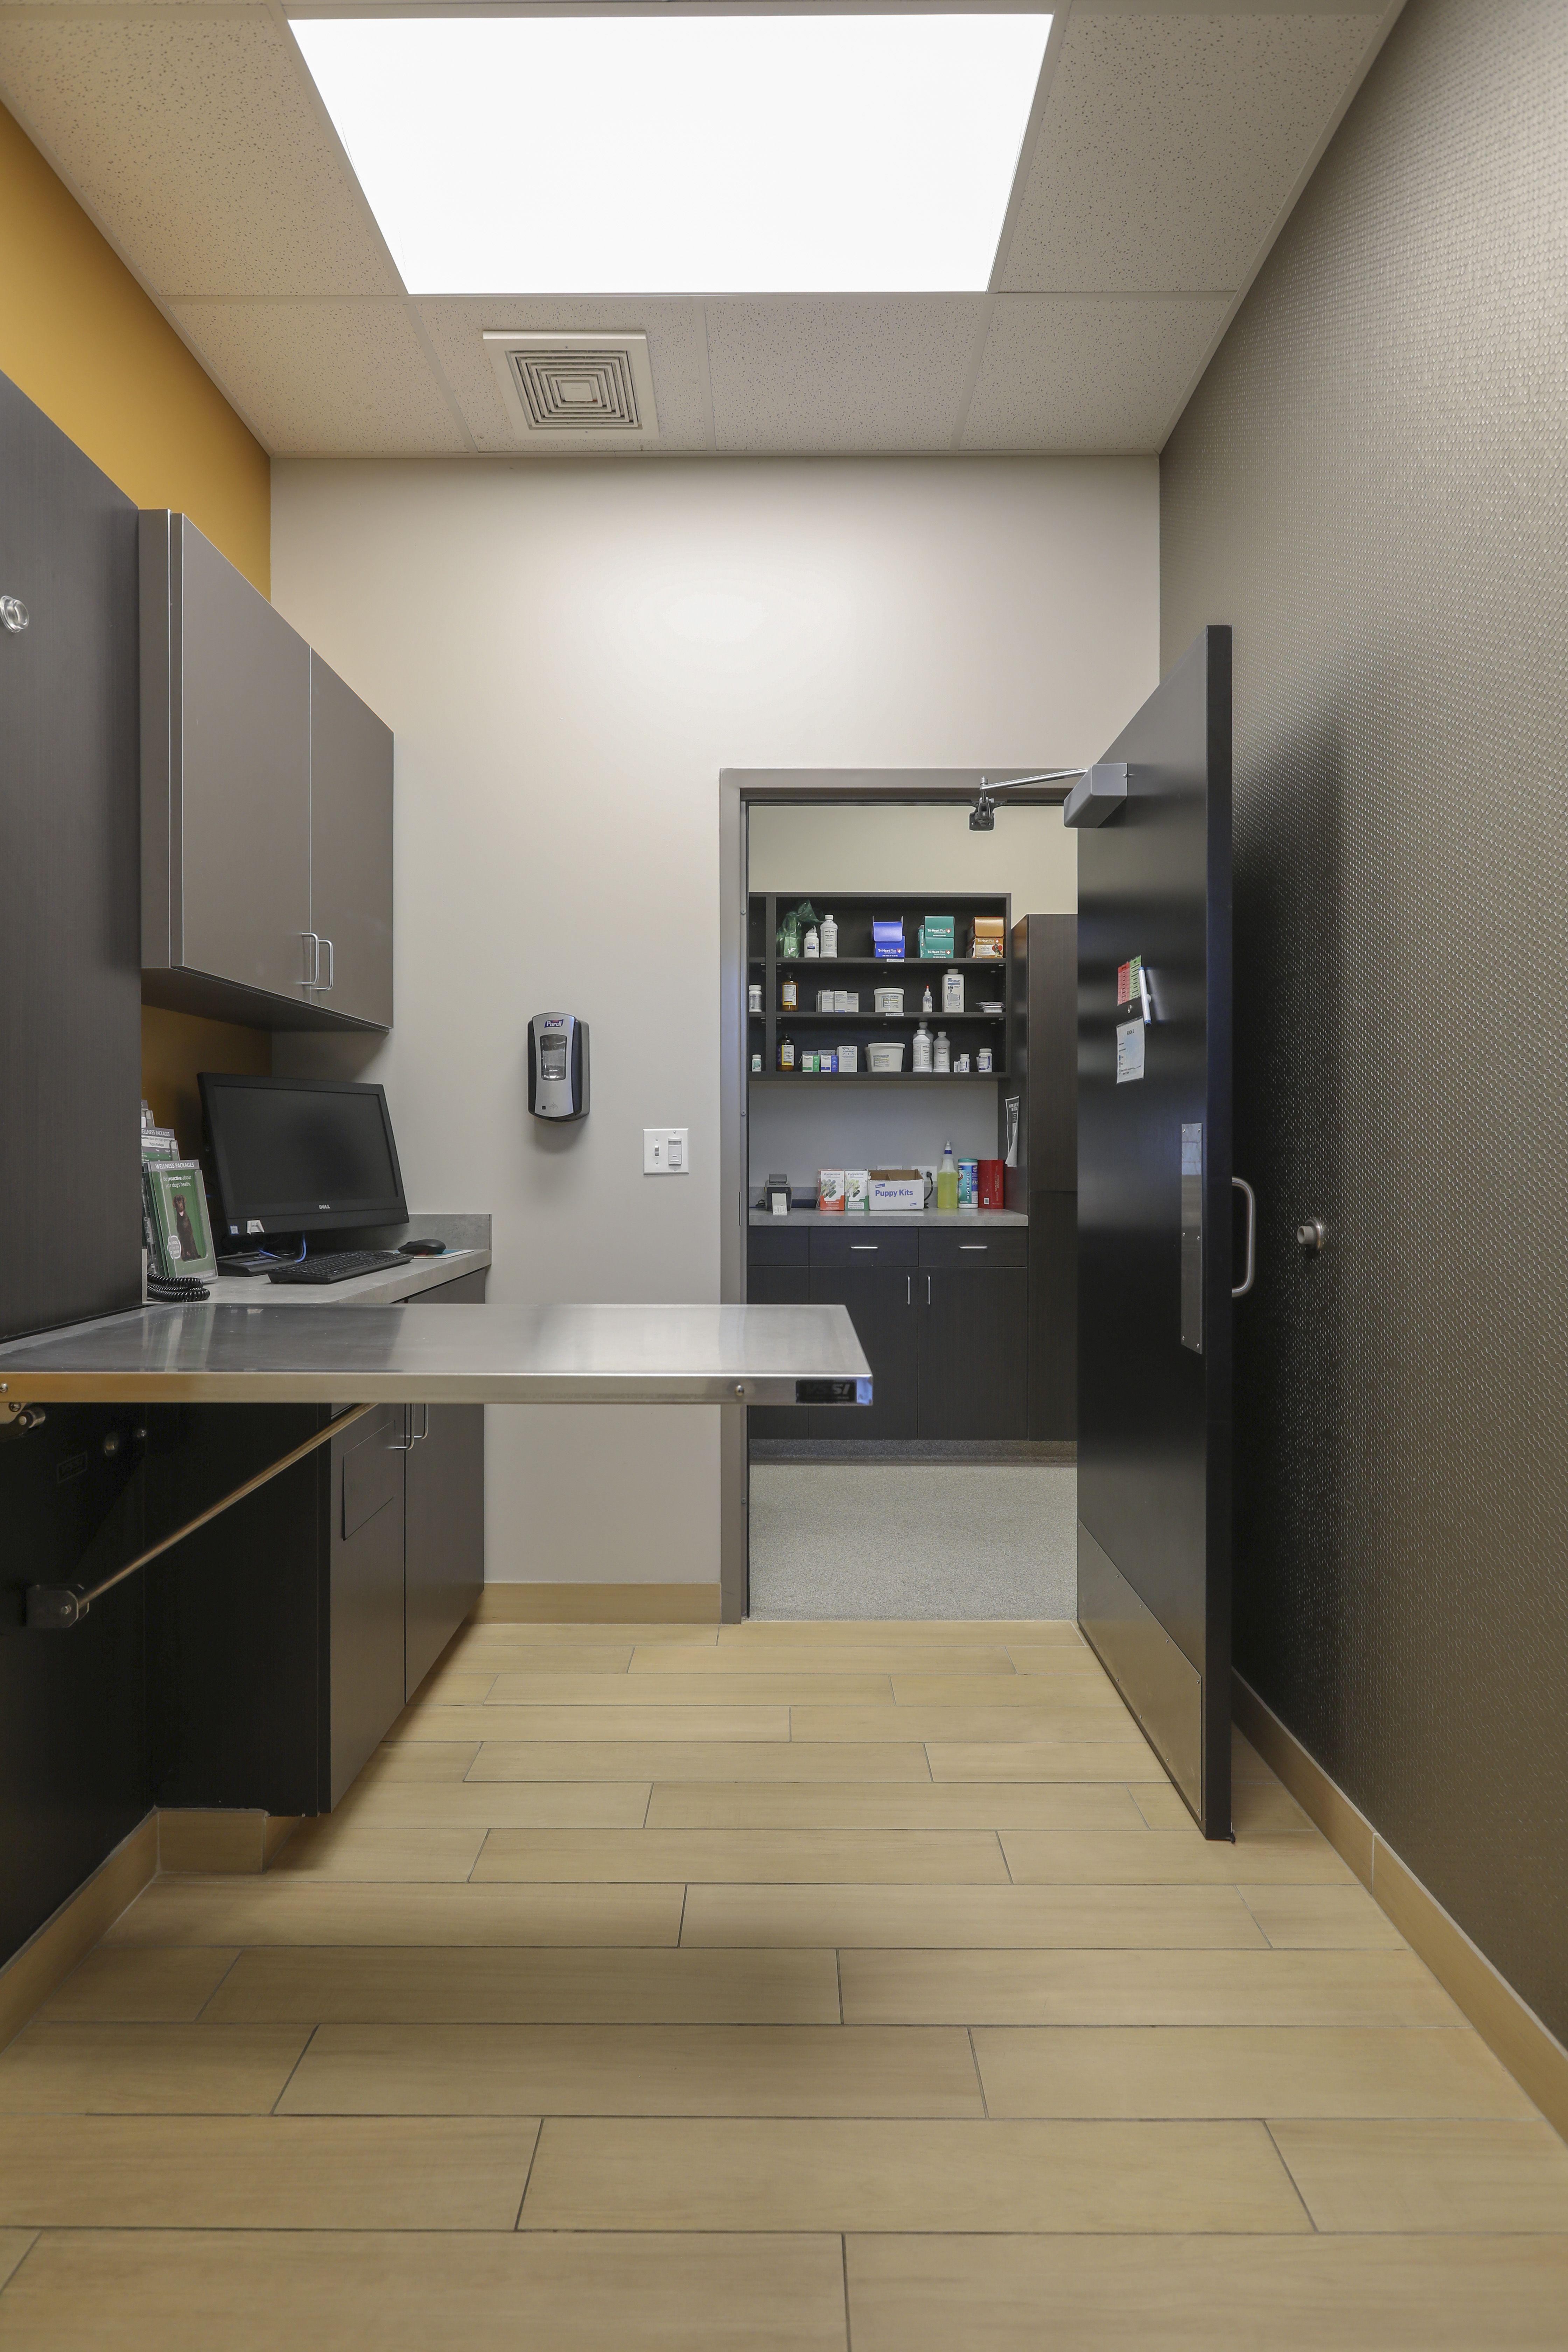 Animal Hospital Exam Room In 2021 Clinic Interior Design Hospital Design Veterinary Clinic